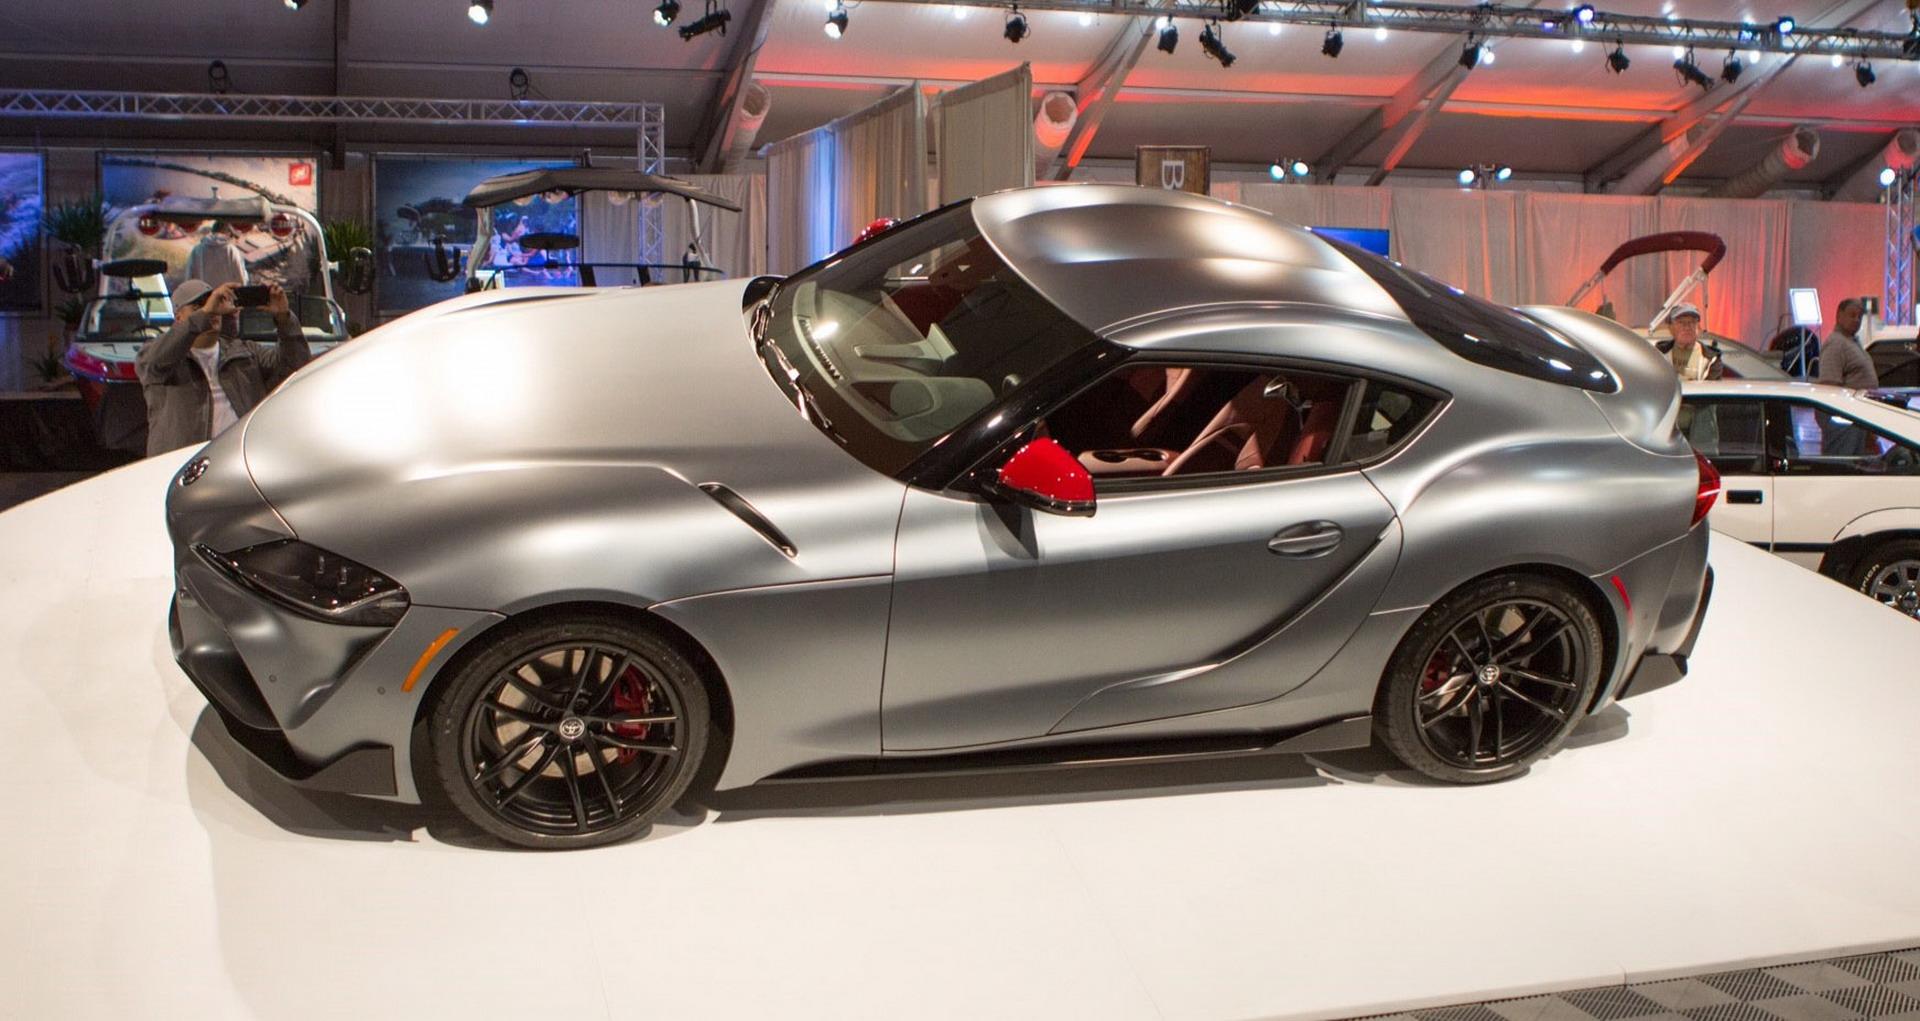 One-Off Toyota Supra's Phantom Grey Paint NOT BMW's Frozen Grey | Carscoops